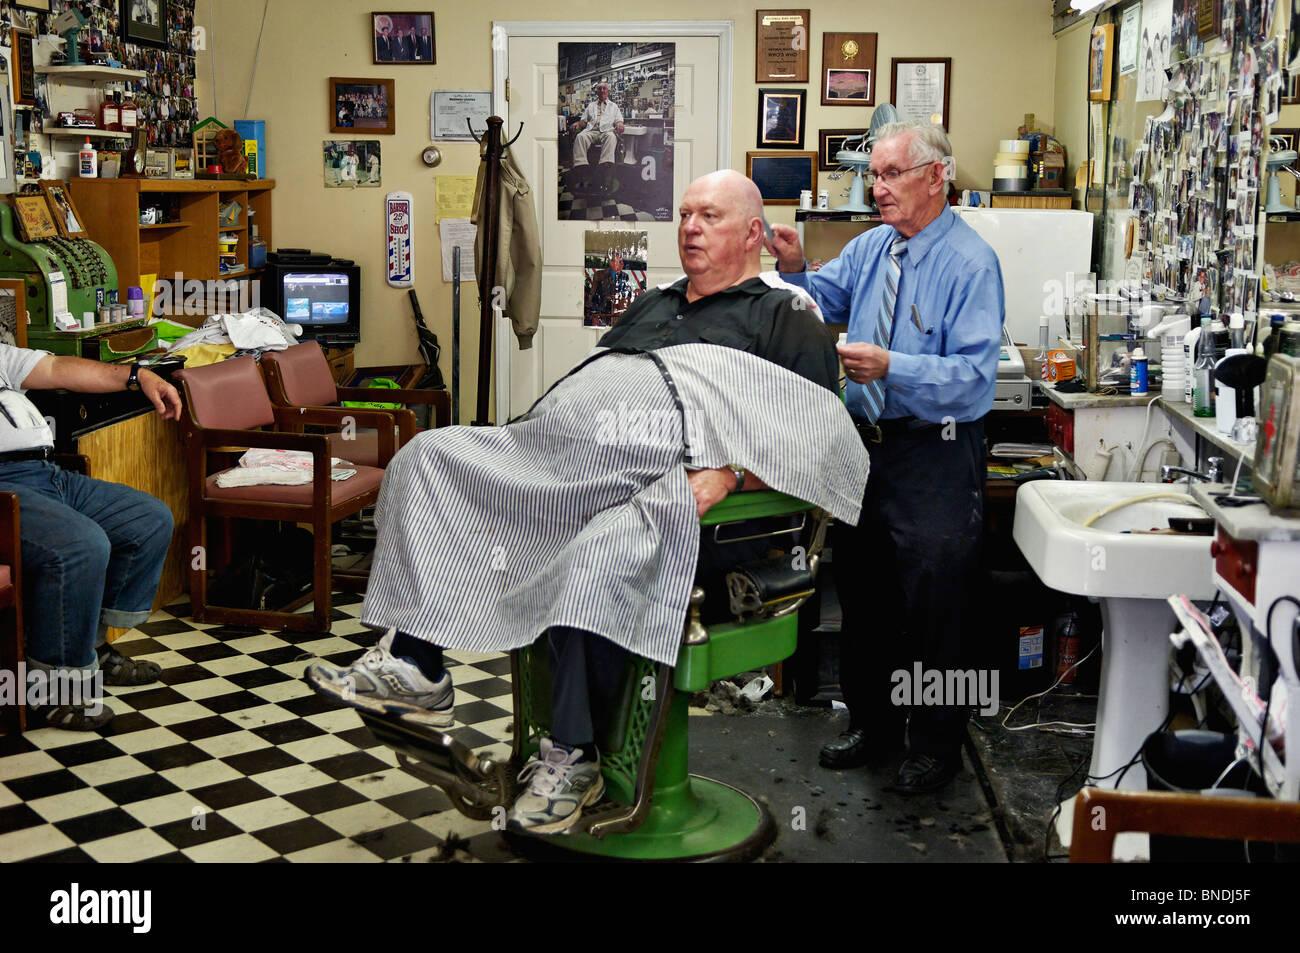 Russell Hiatt Cutting Hair in Floyd's City Barber Shop in Mount Airy, North Carolina Stock Photo